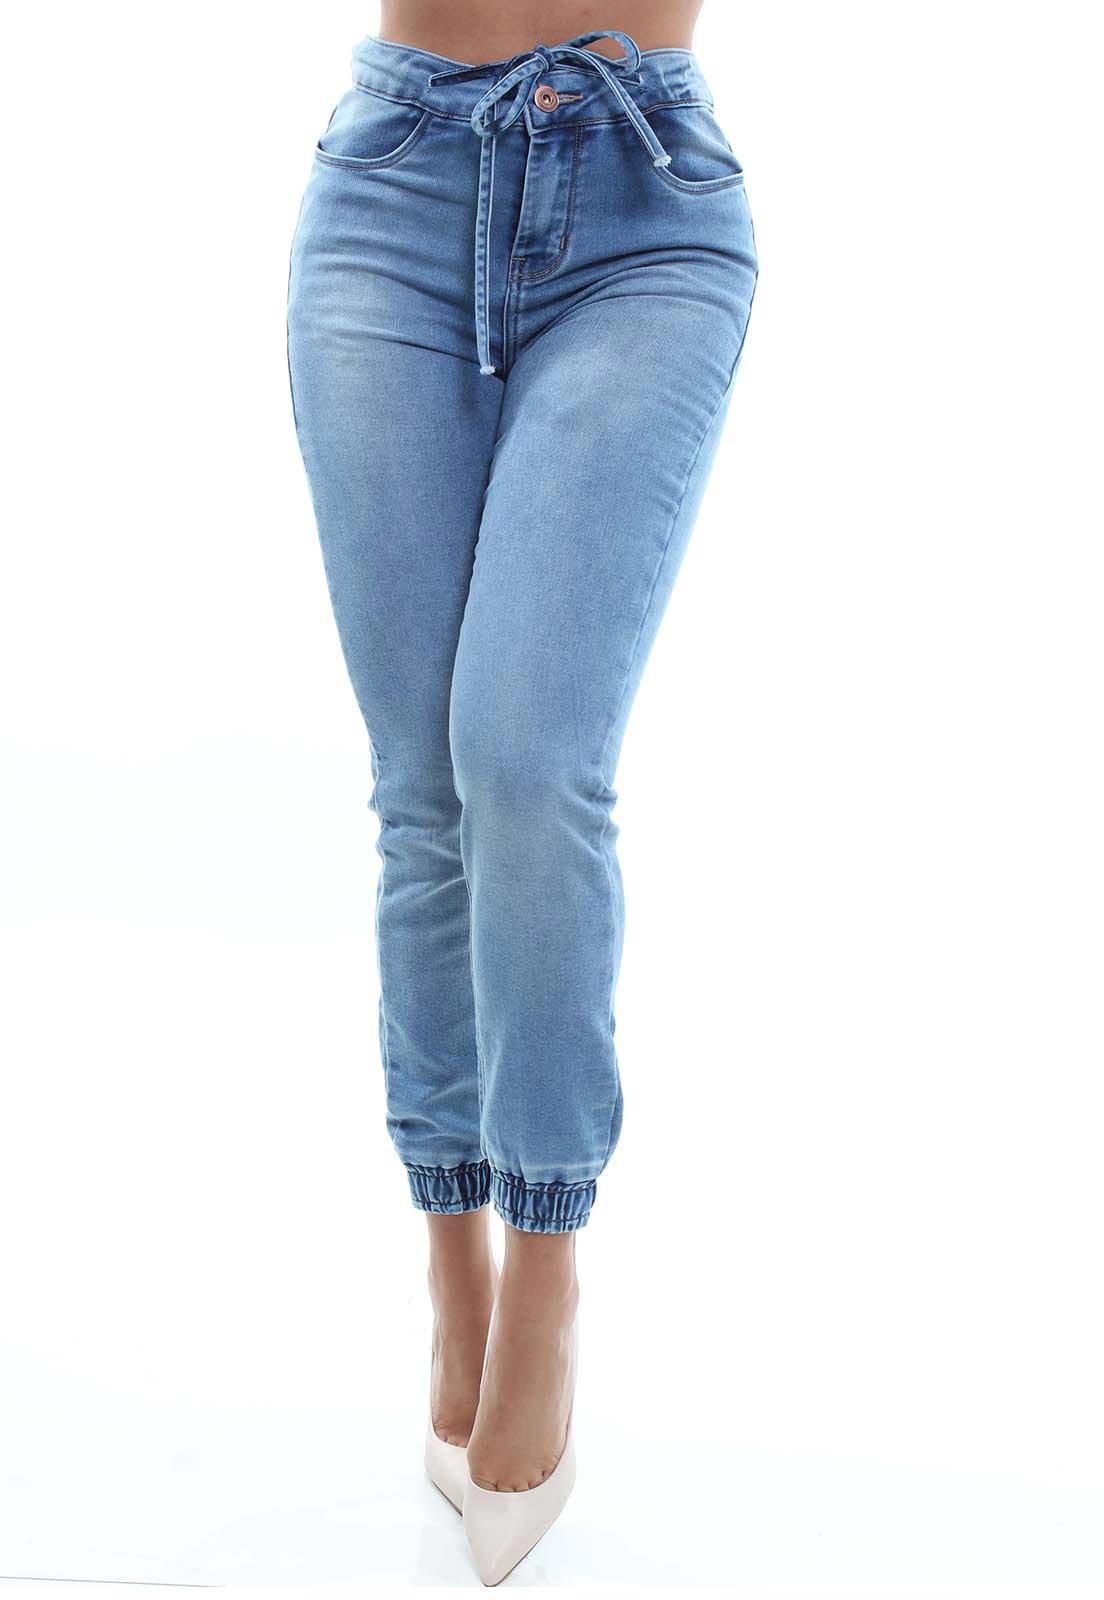 Calça Jeans Feminina Jogger Crocker -48063  - CROCKER JEANS